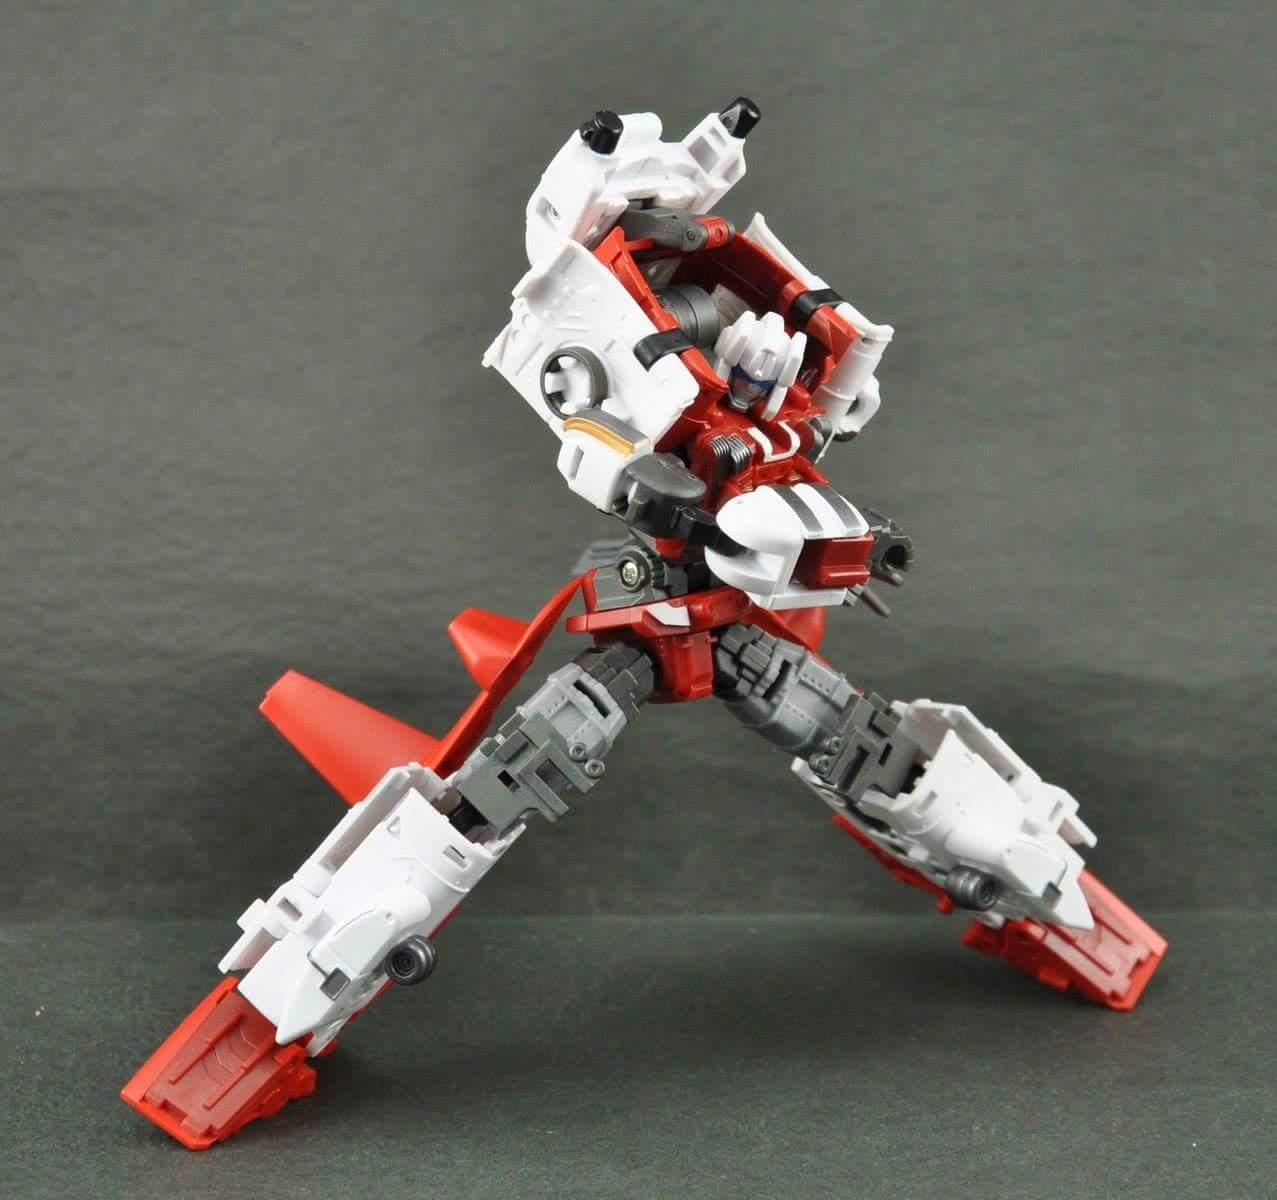 [MakeToys] Produit Tiers - Jouet MTCM-04 Guardia (aka Protectobots - Defensor/Defenso) - Page 3 9ltTRQb1